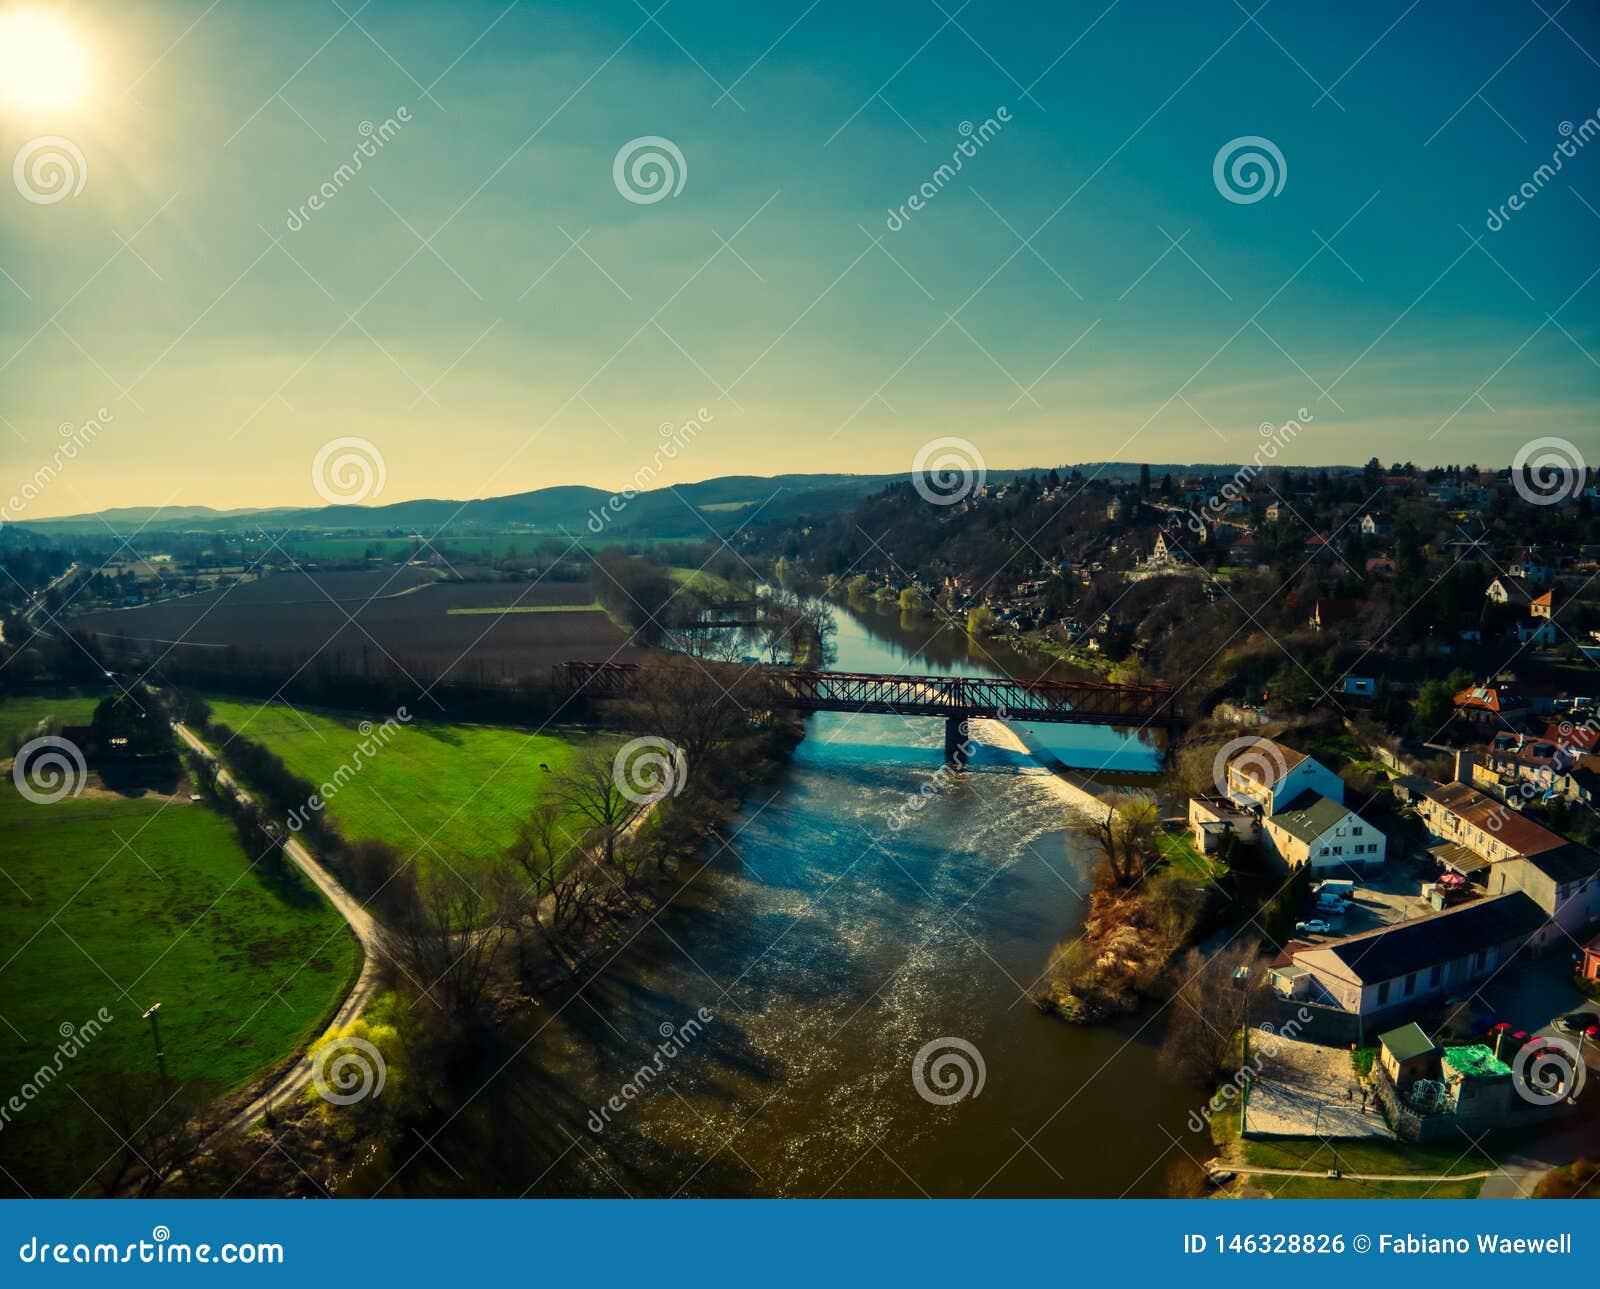 Cernosice αγροτικό τραίνο ποταμών vltava πτήσης κηφήνων εναέριο